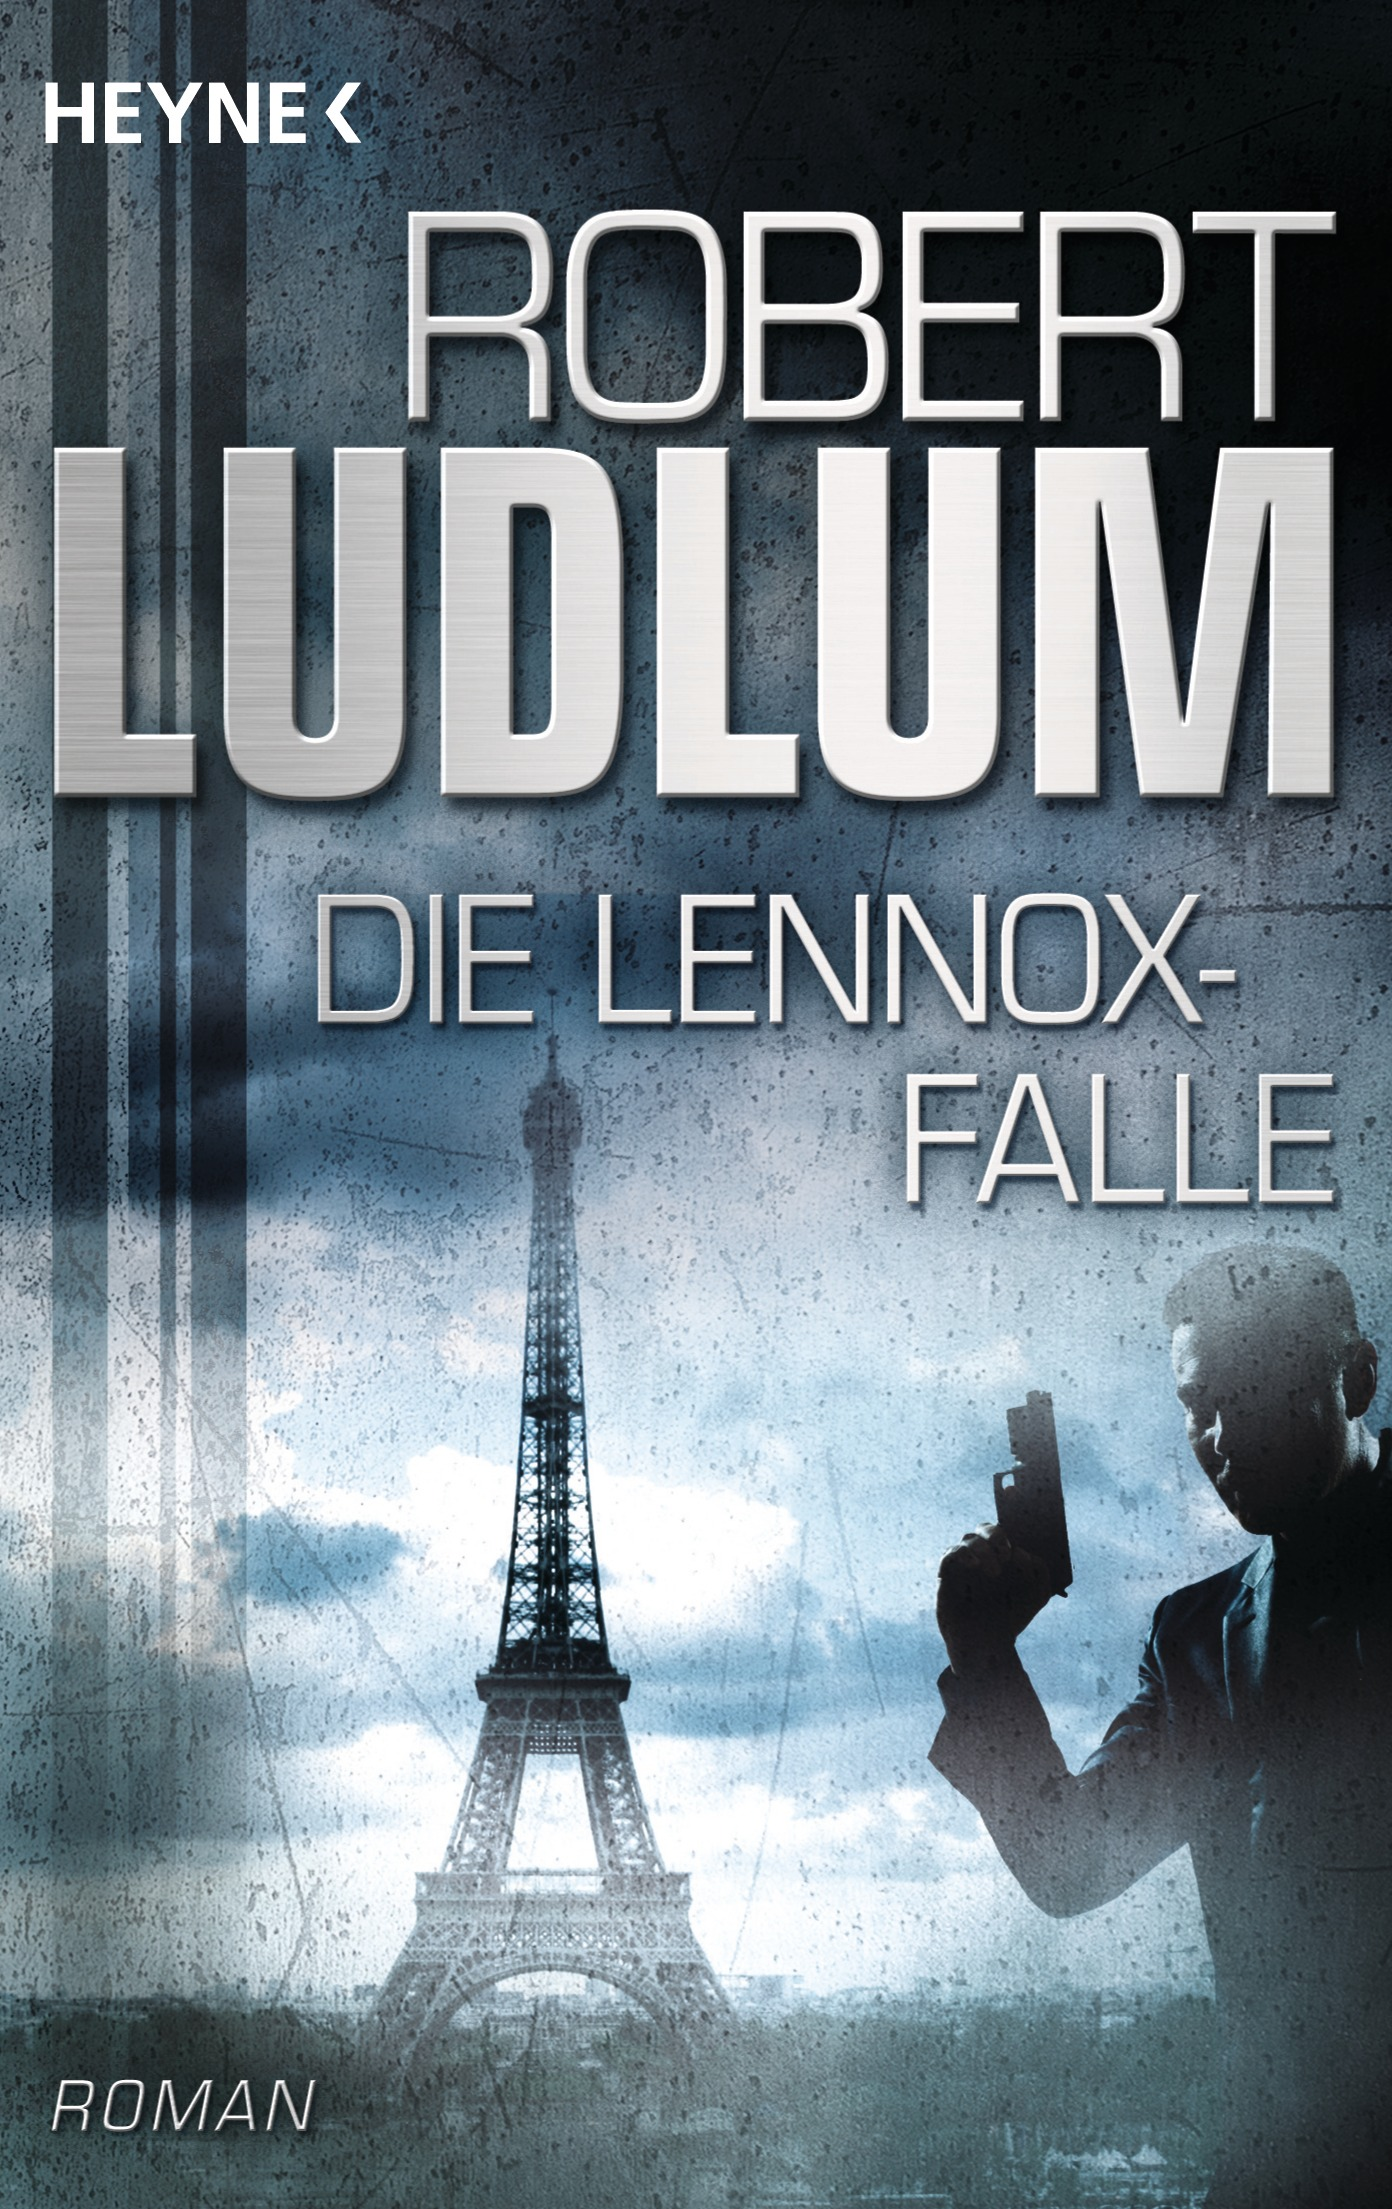 Die Lennox-Falle - Robert Ludlum